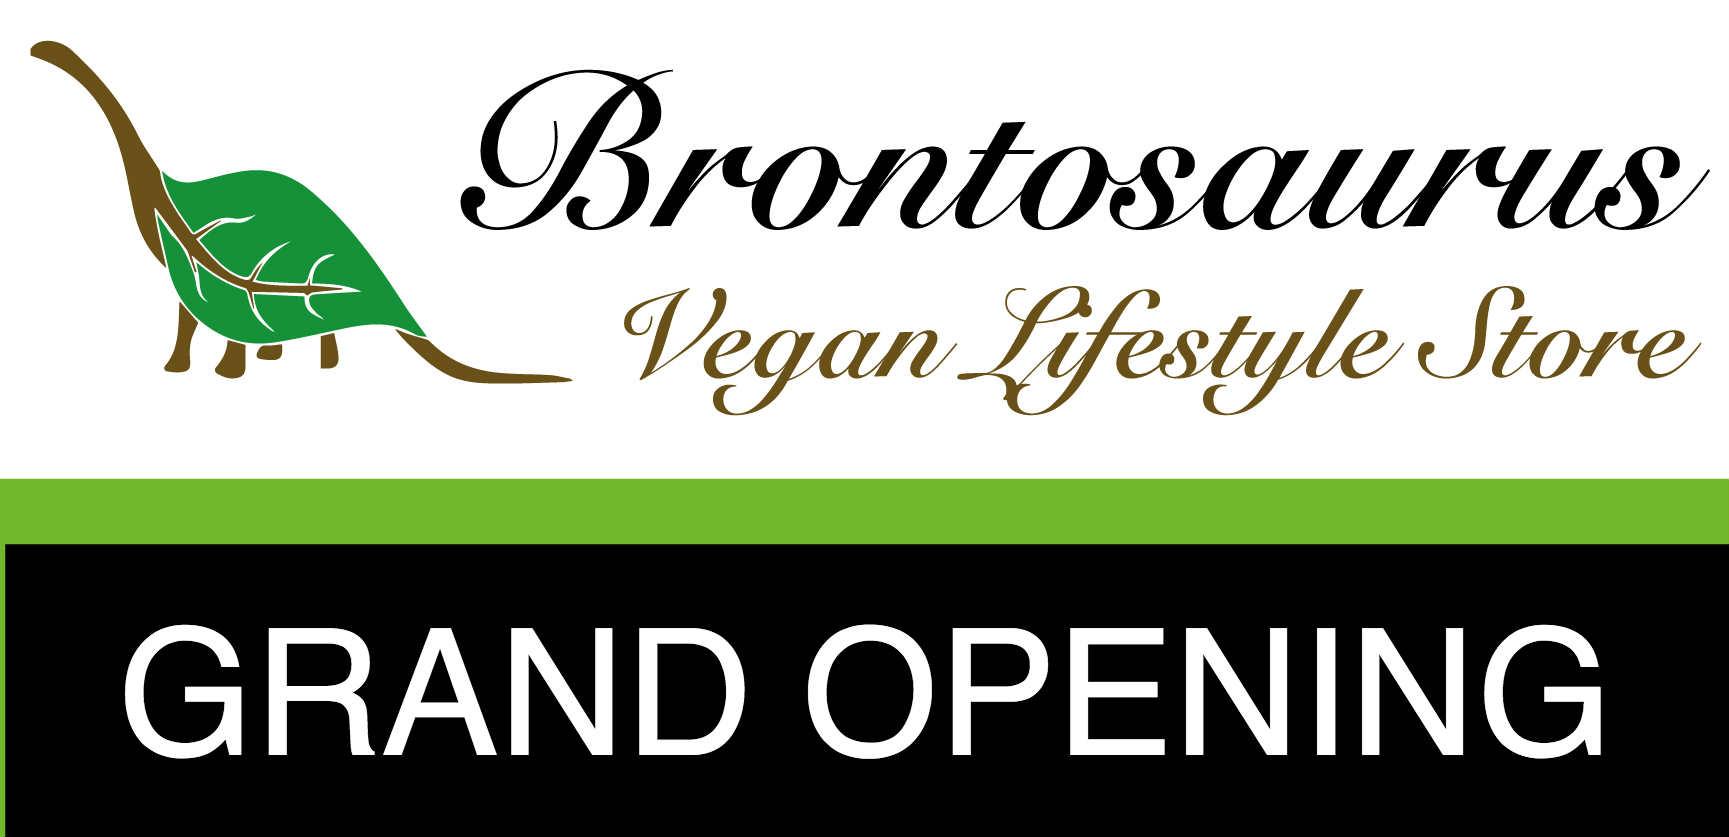 New vegan store in Swansea